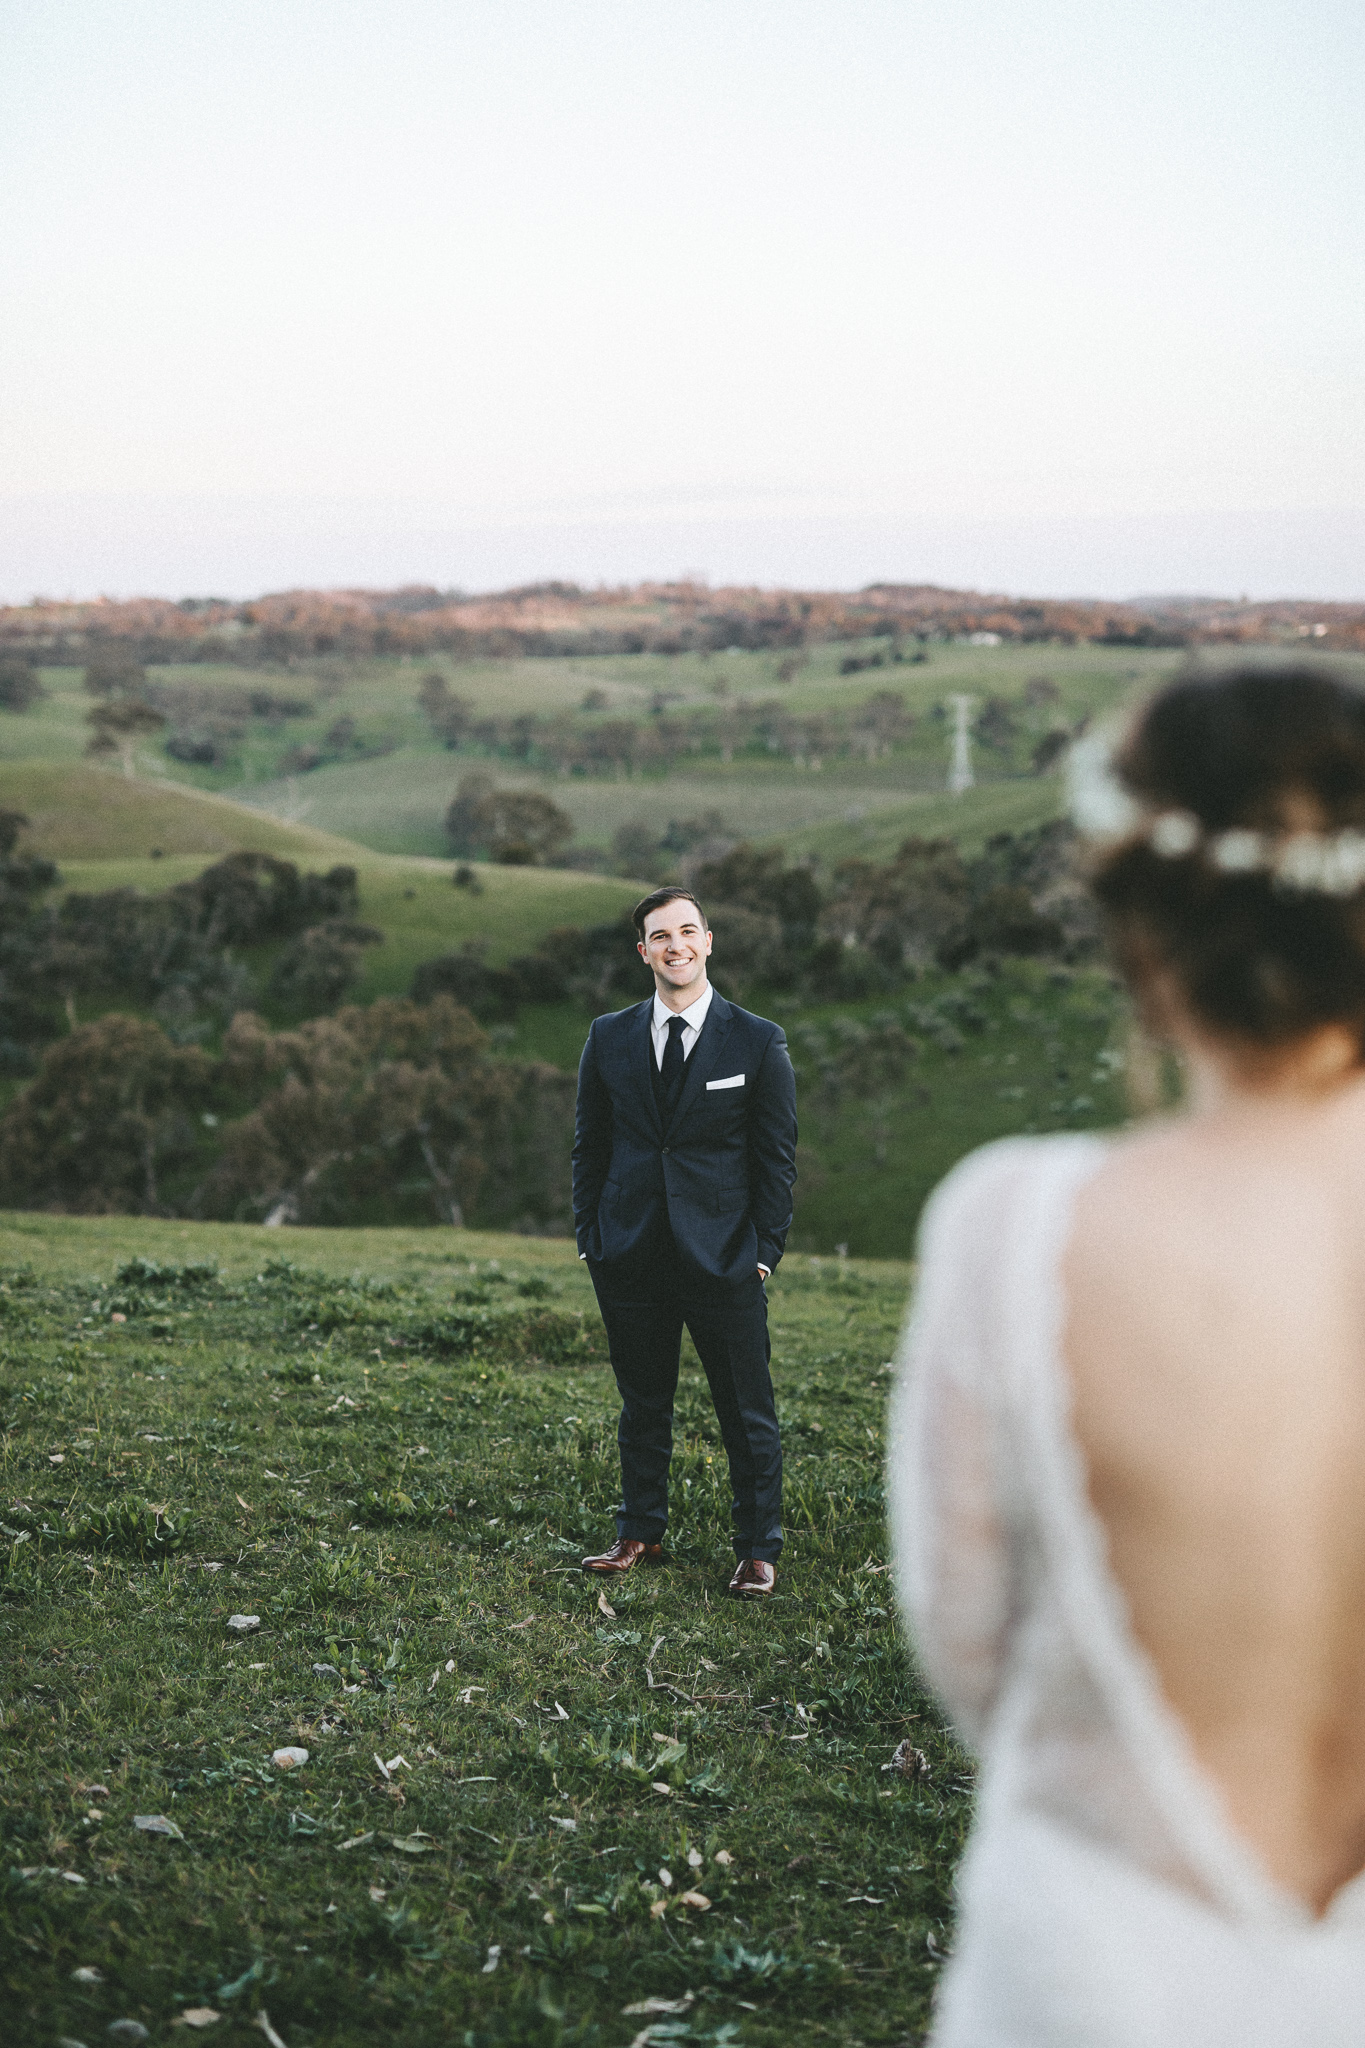 christopher morrison_adelaide hills wedding_ andy + teegan_103_1183.jpg